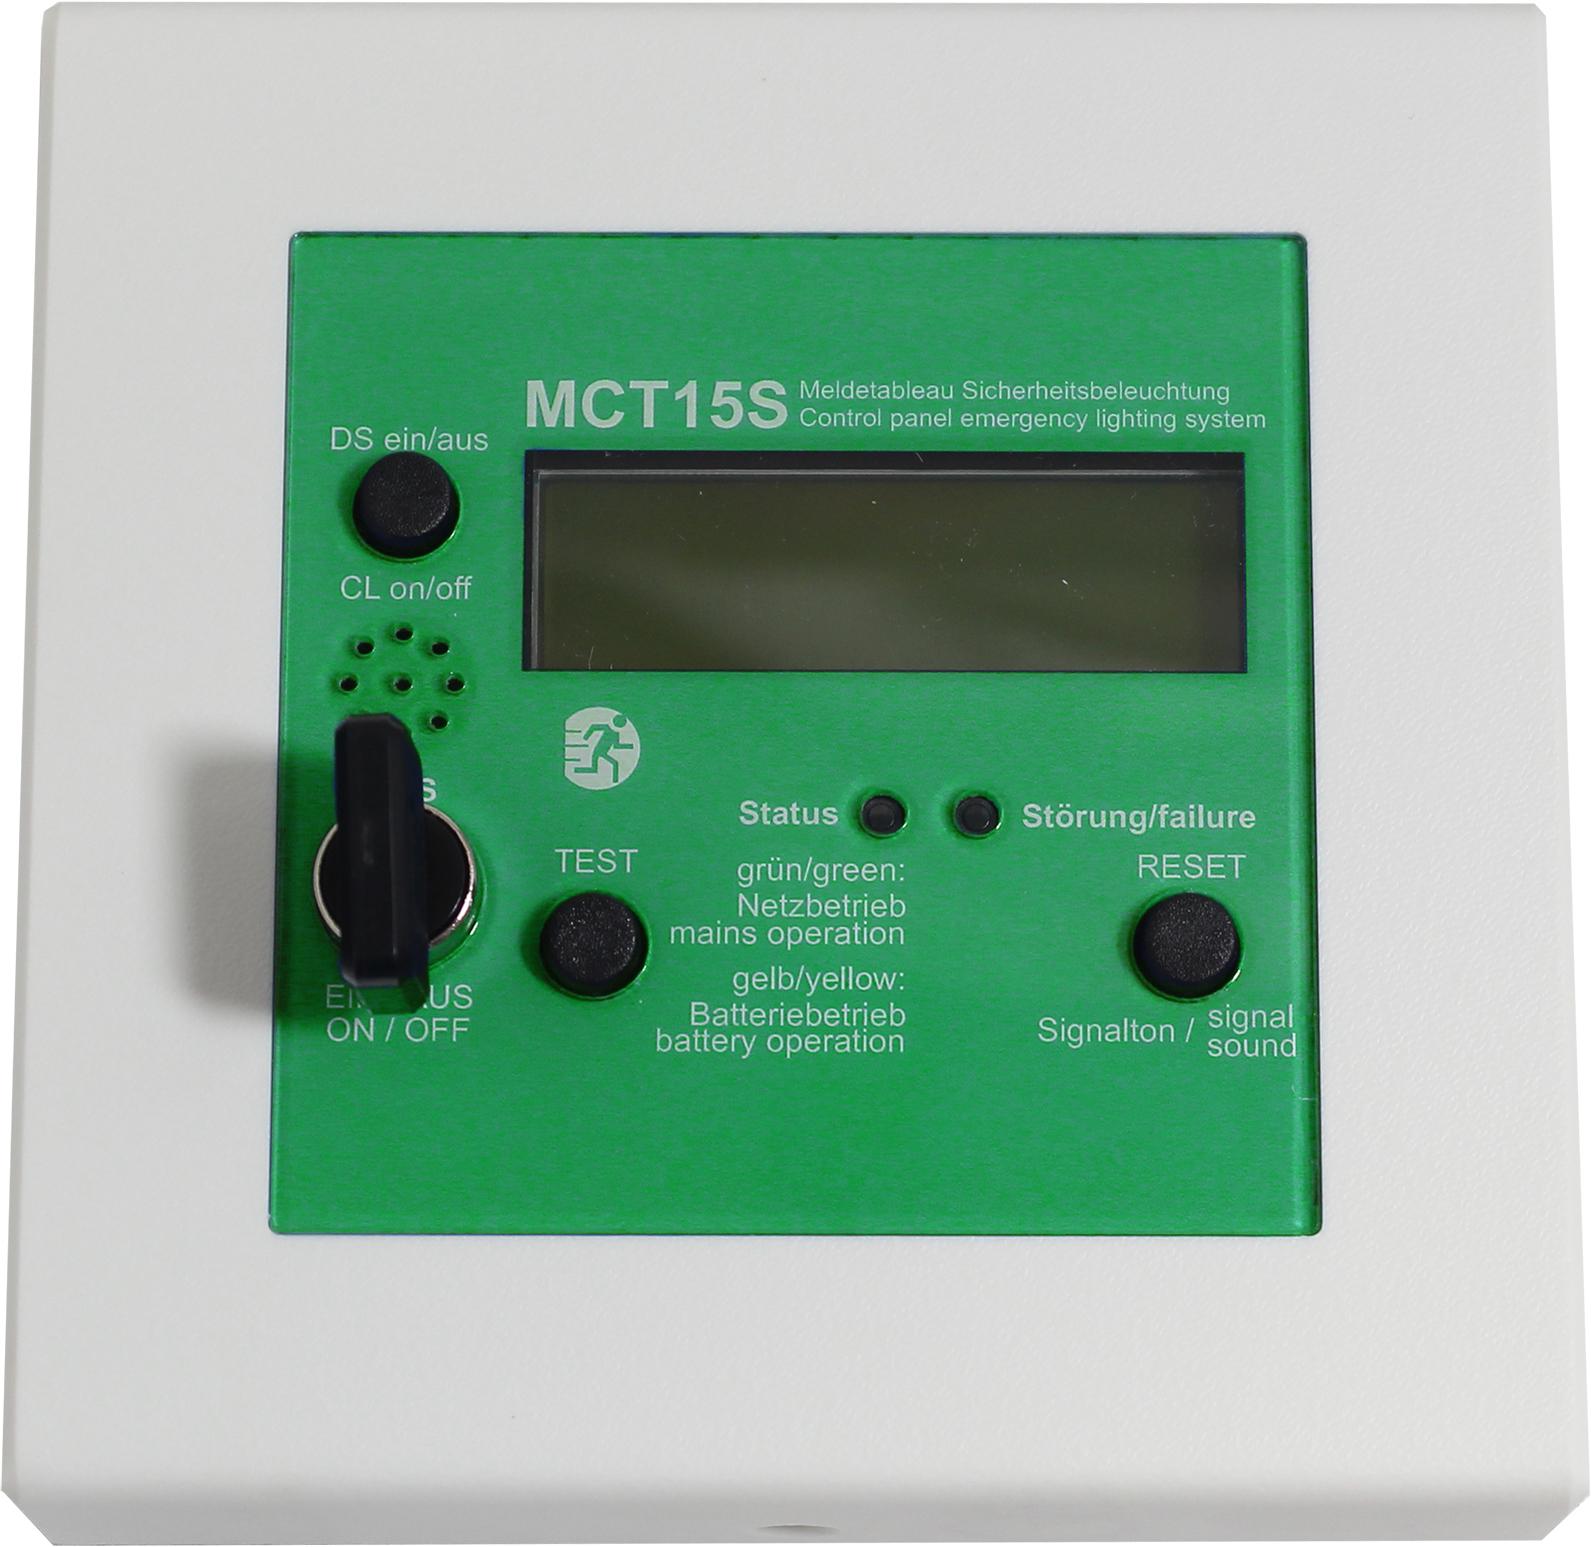 Fernmeldetableau - MCT-15